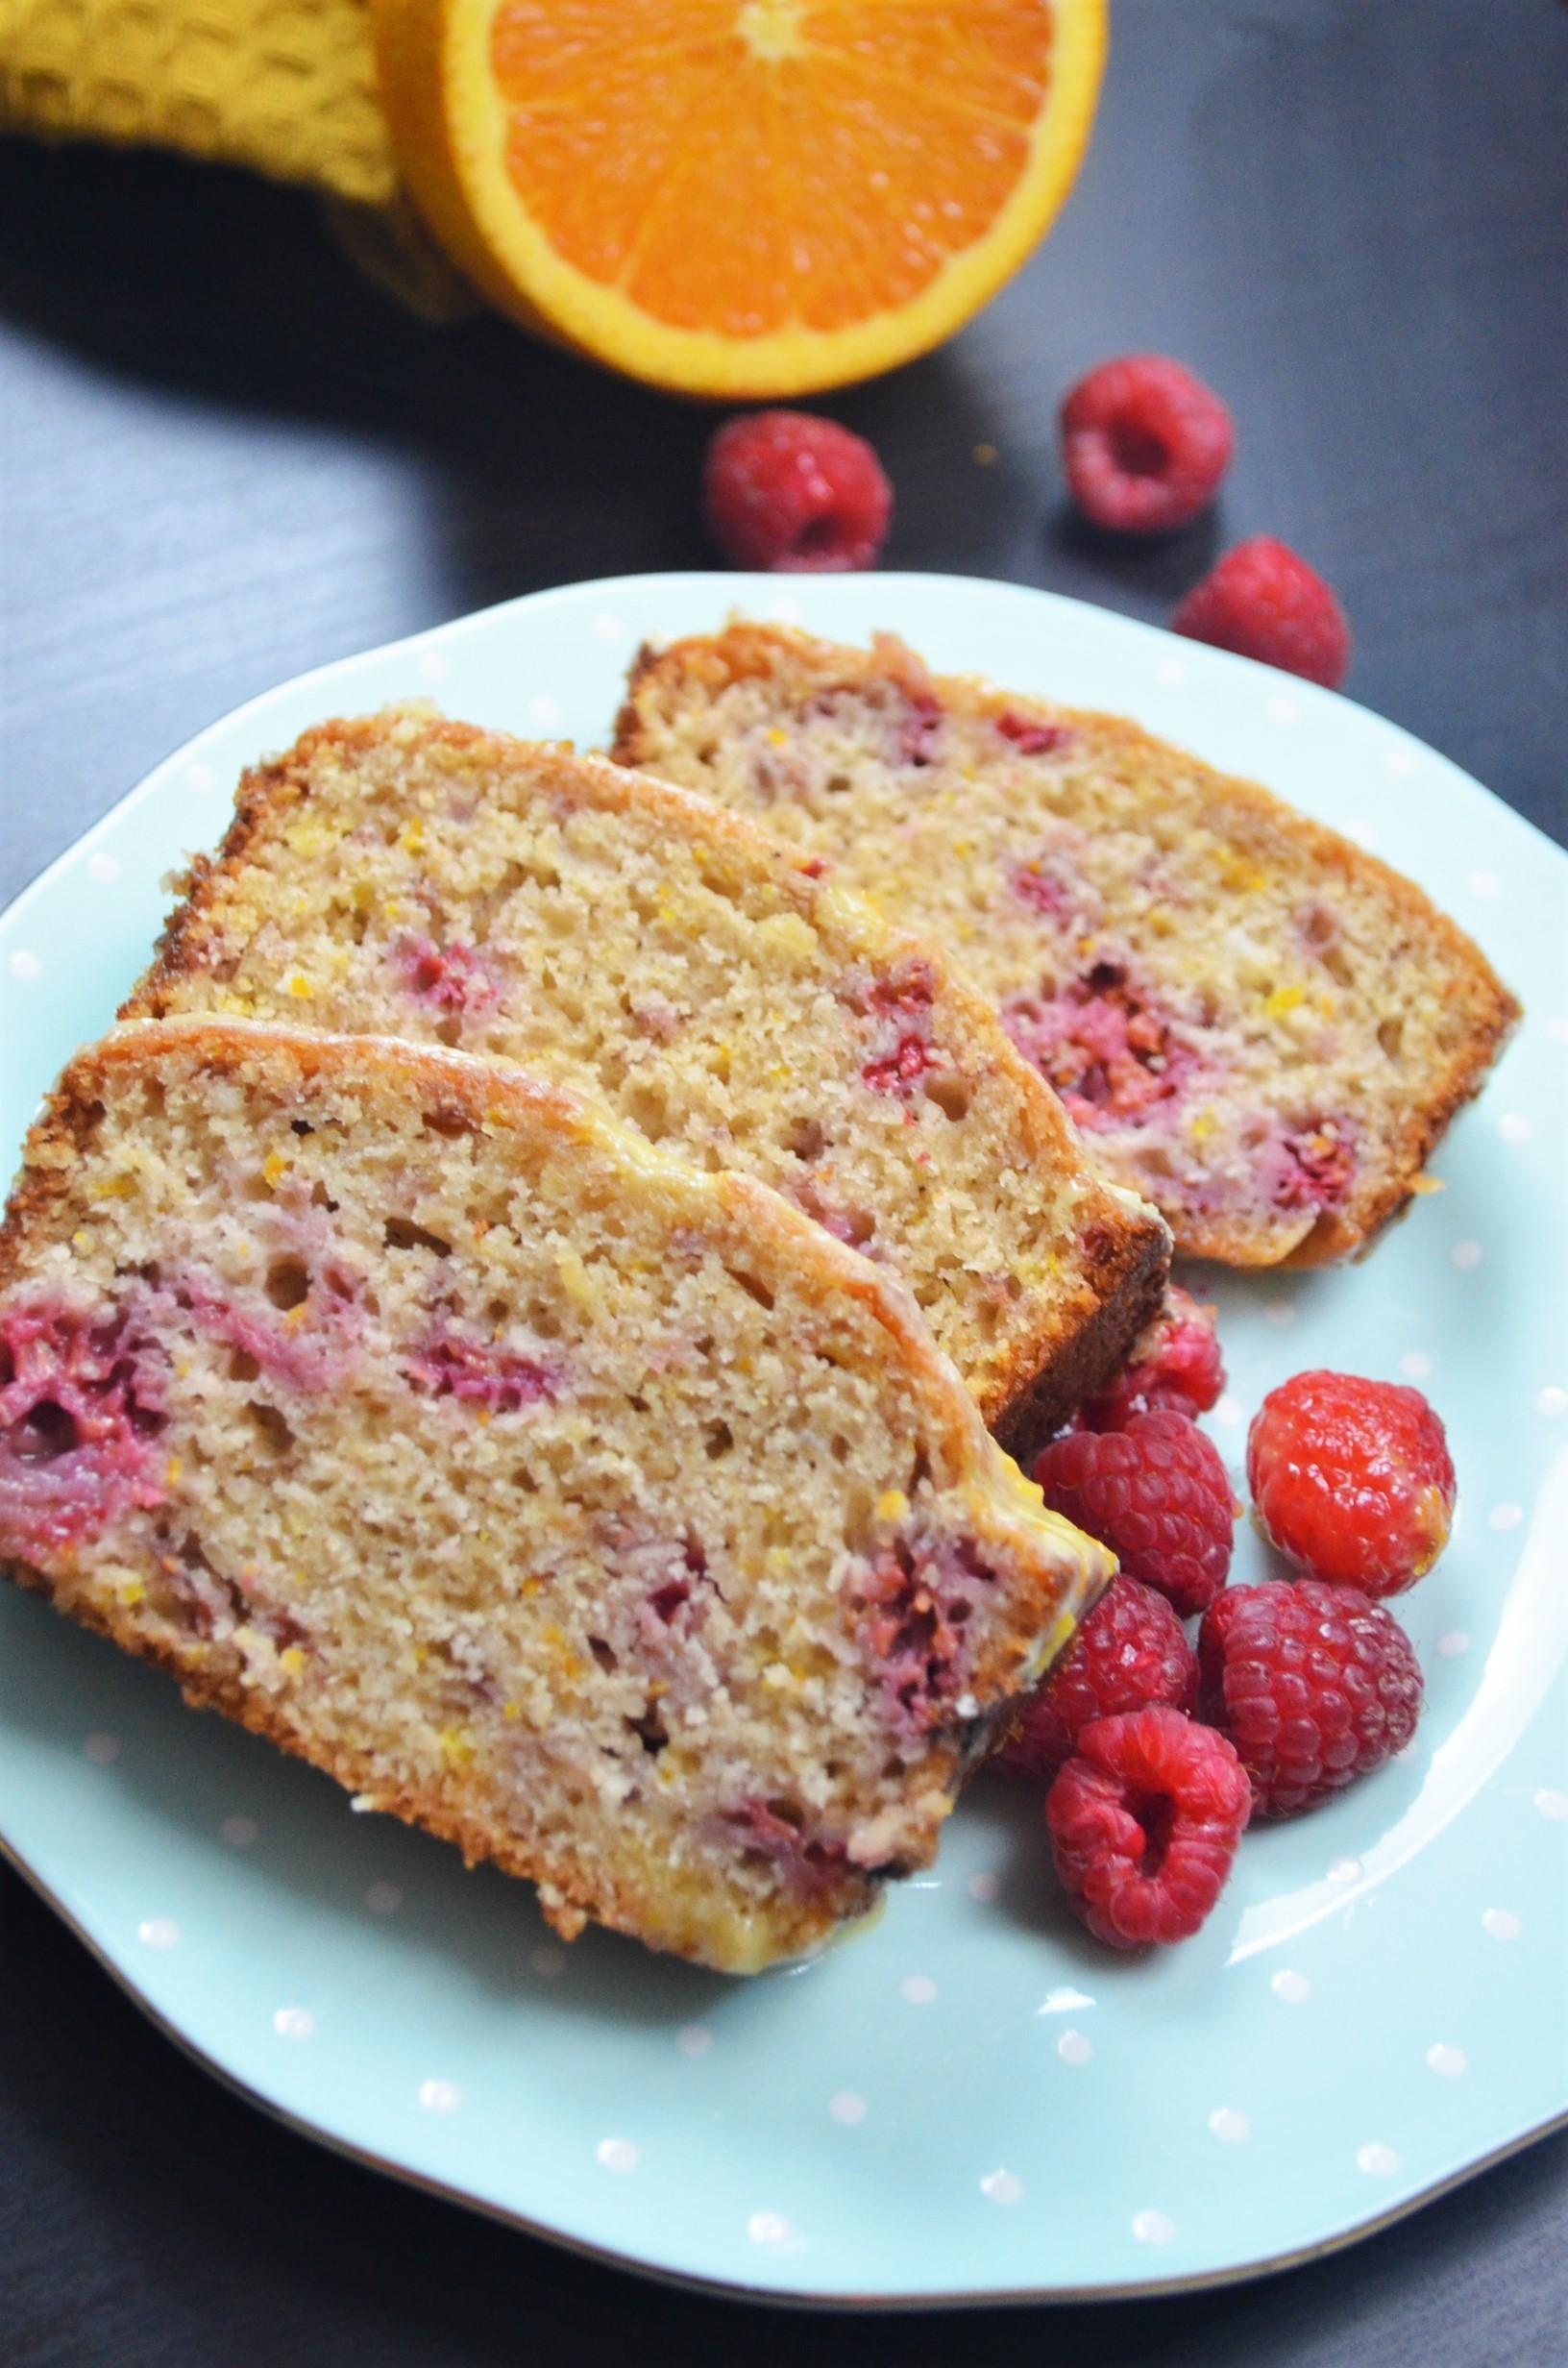 Orange and Raspberry Loaf Bread